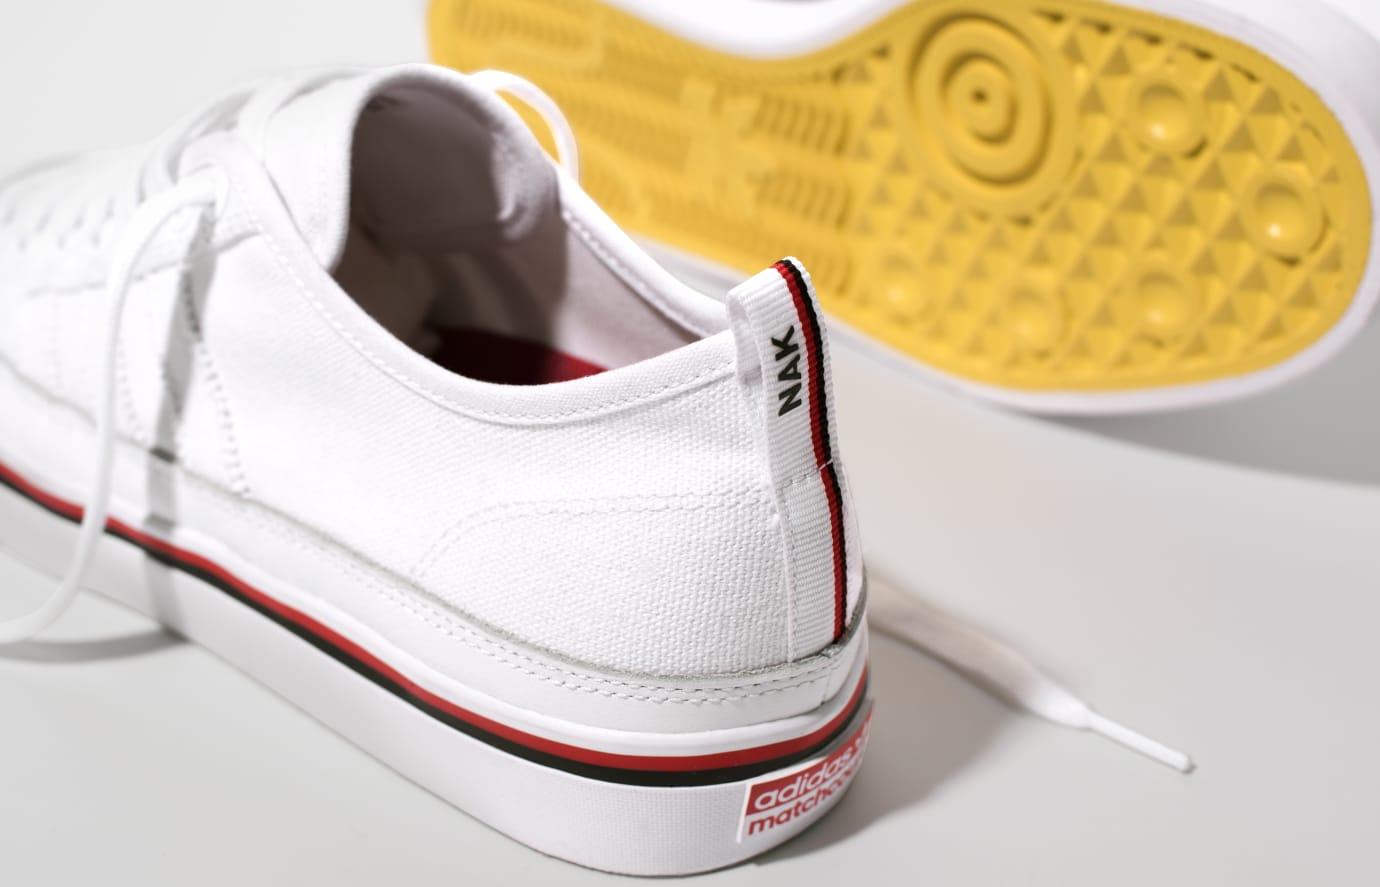 low priced 1eda0 a3c85 adidas skateboarding x na-kel smith collab